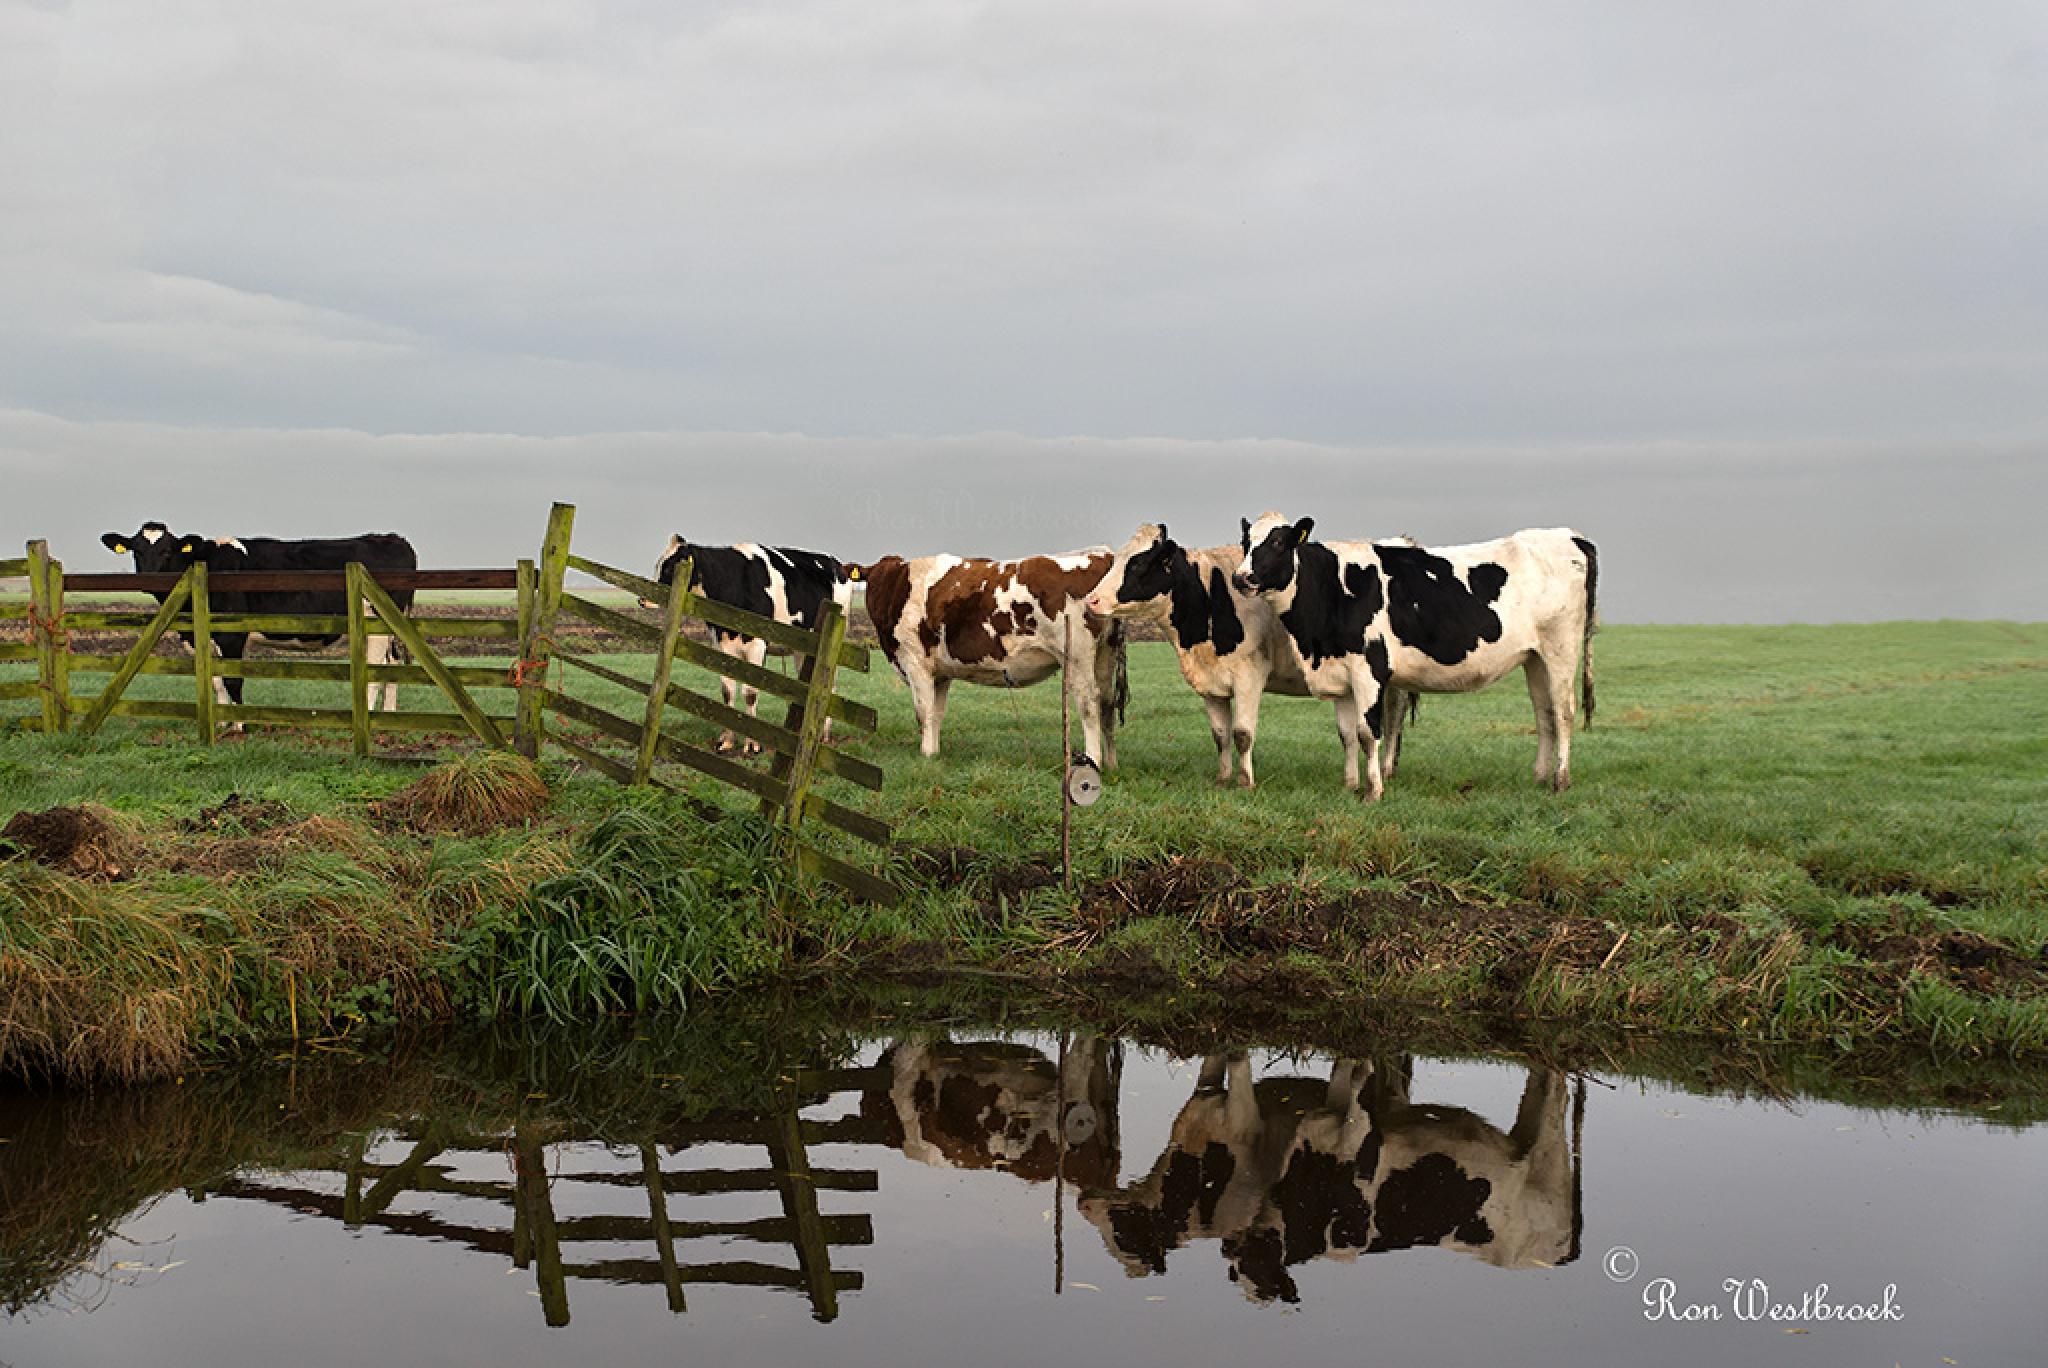 Pure Dutch  by Ron Westbroek